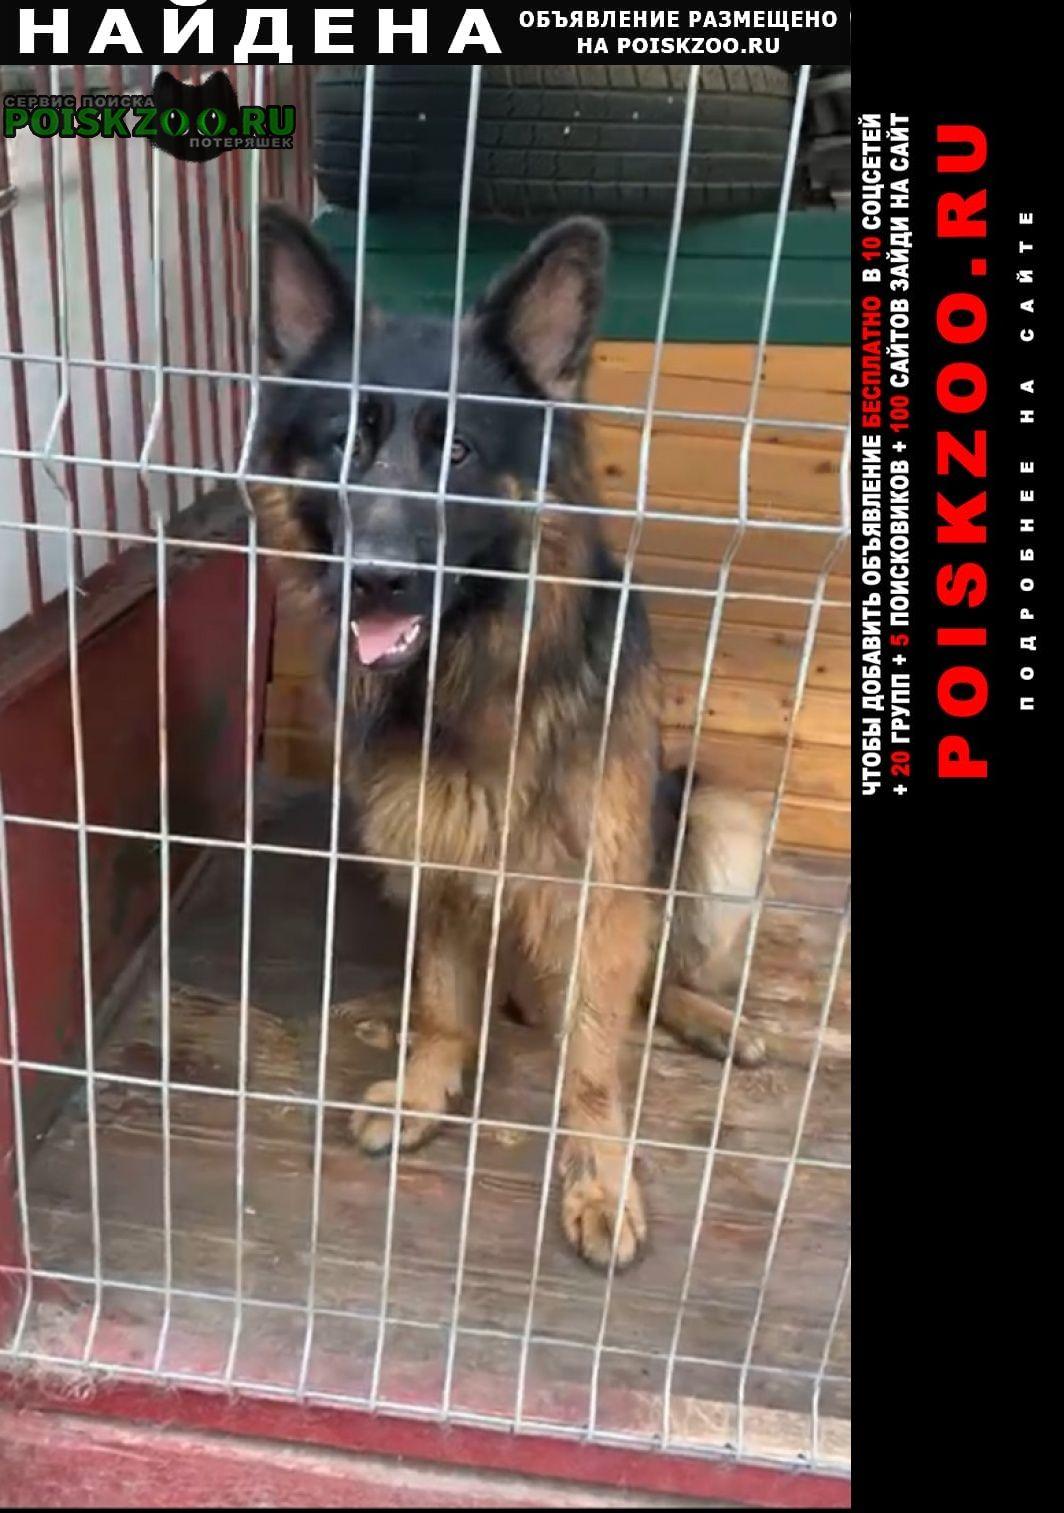 Найдена собака кобель немецкой овчарки Краснодар